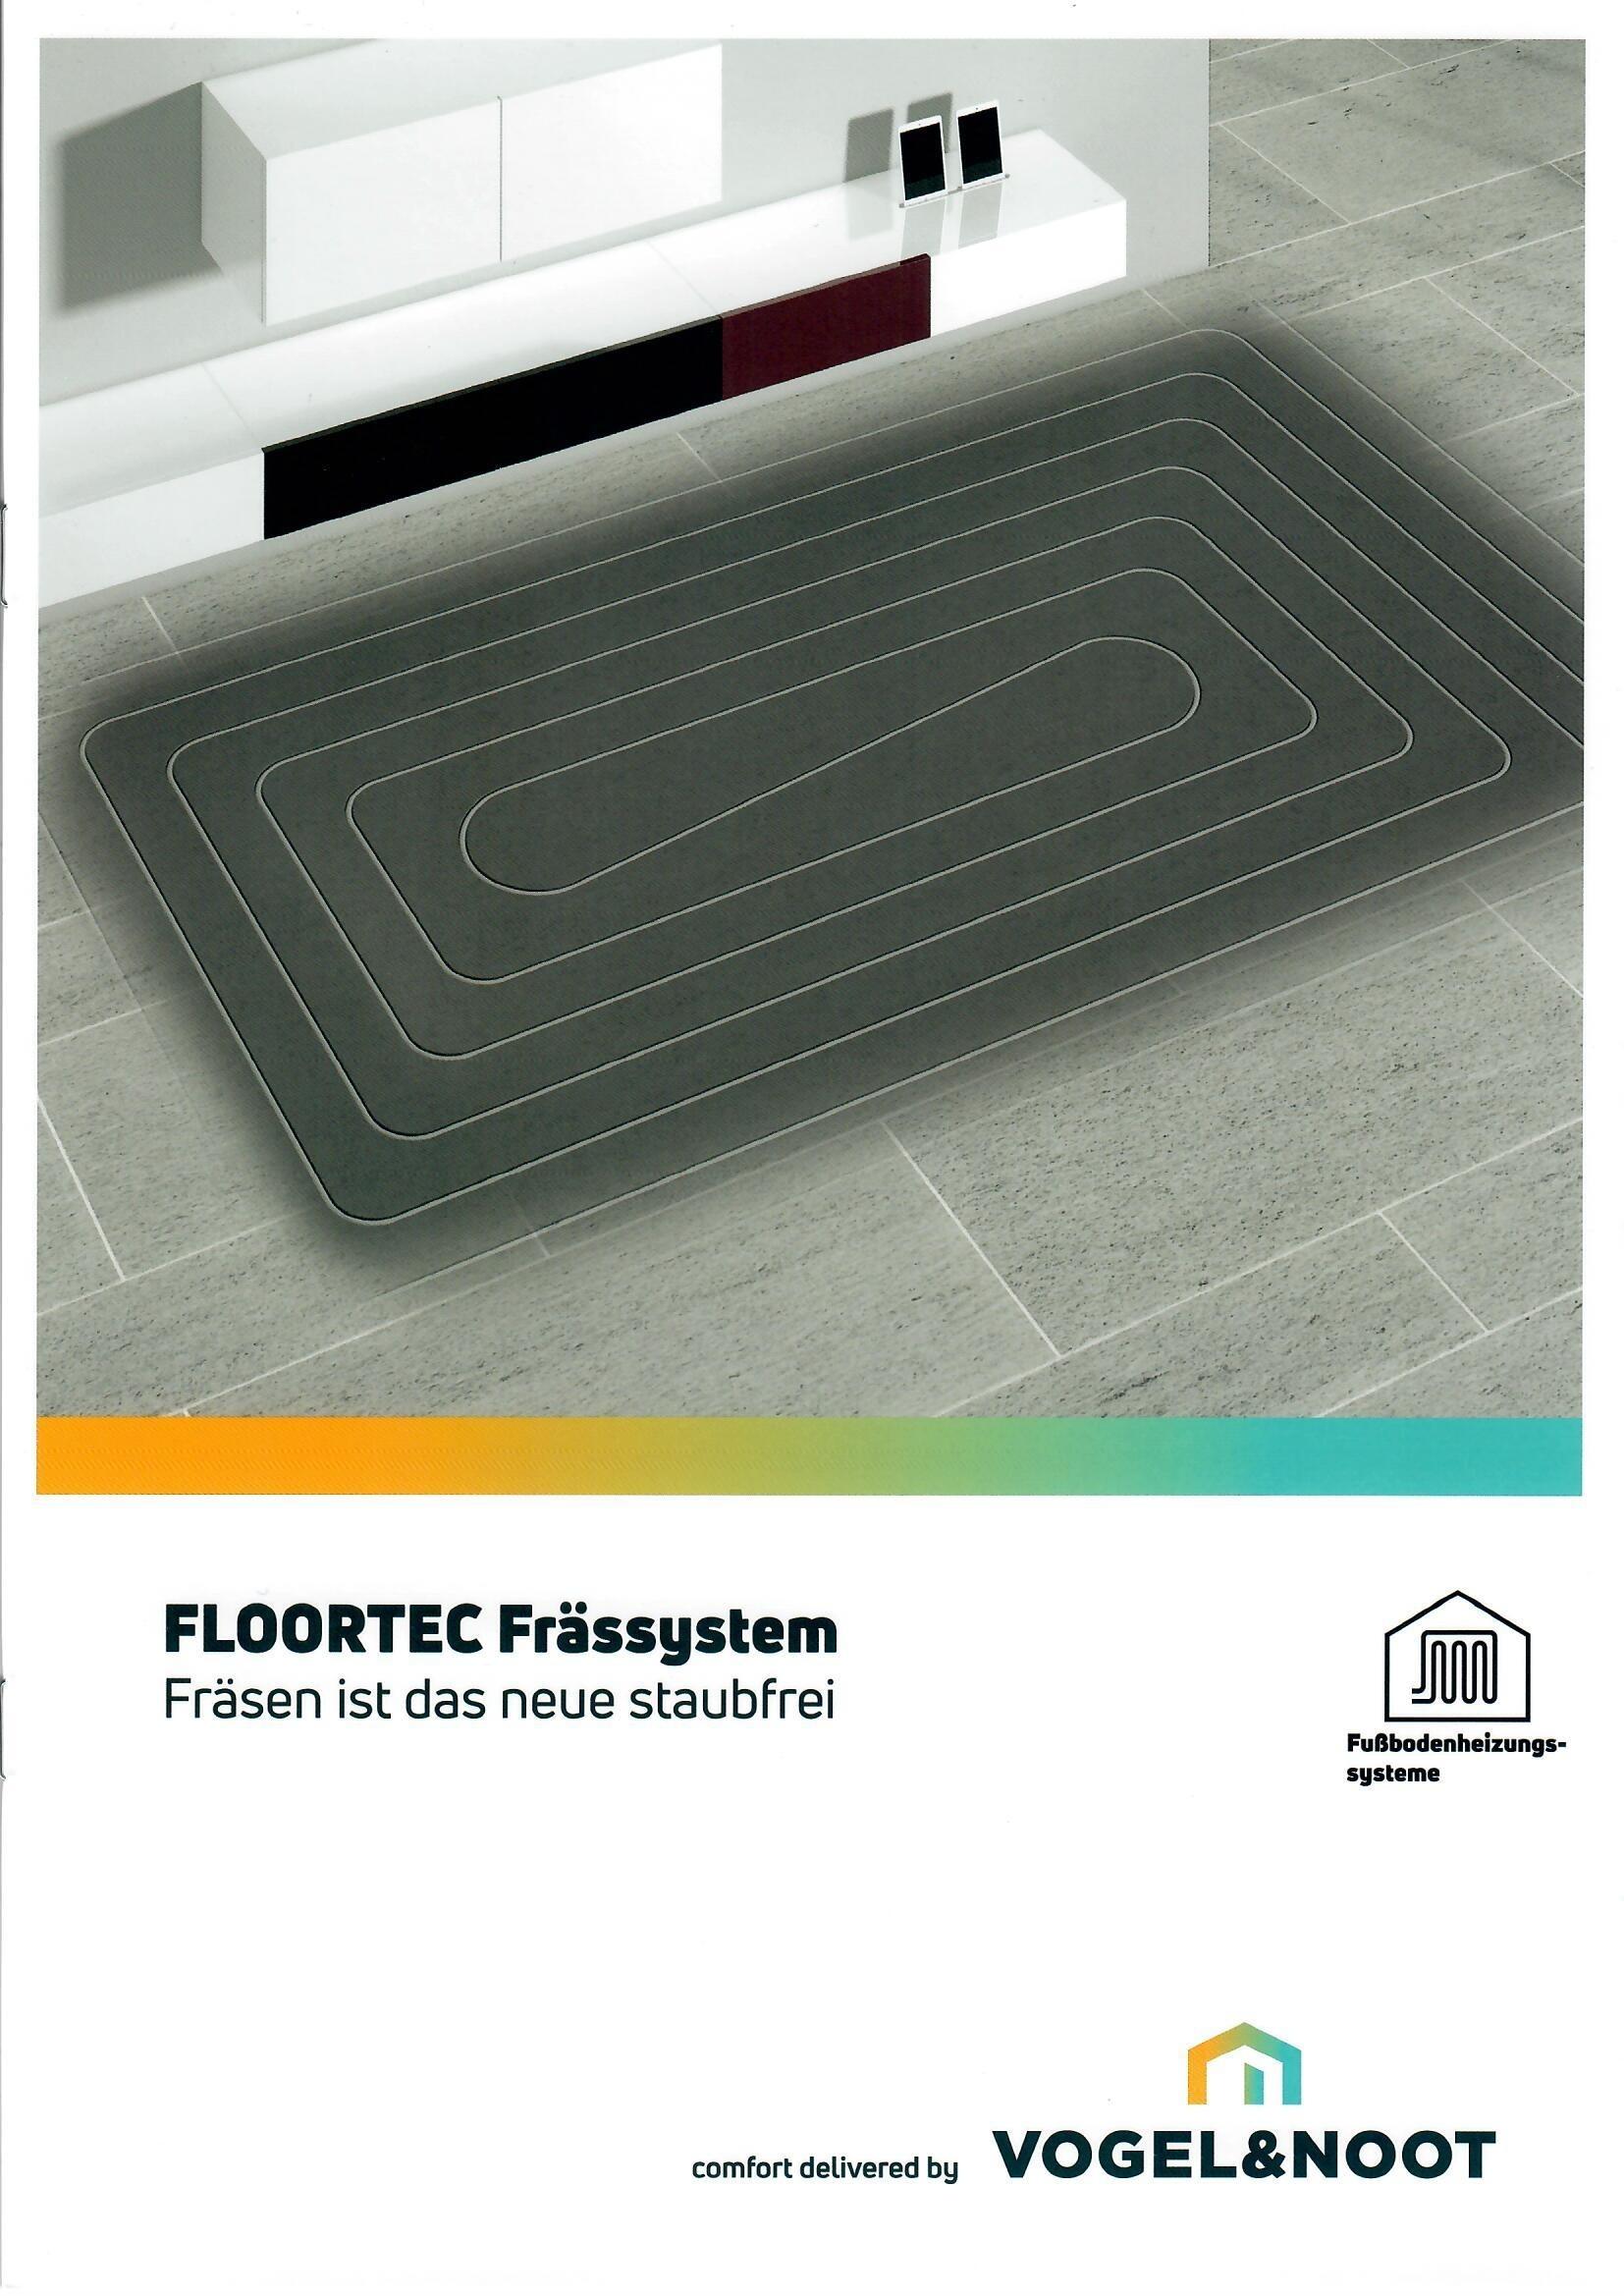 PROSPEKT FLOORTEC FRÄSSYSTEM